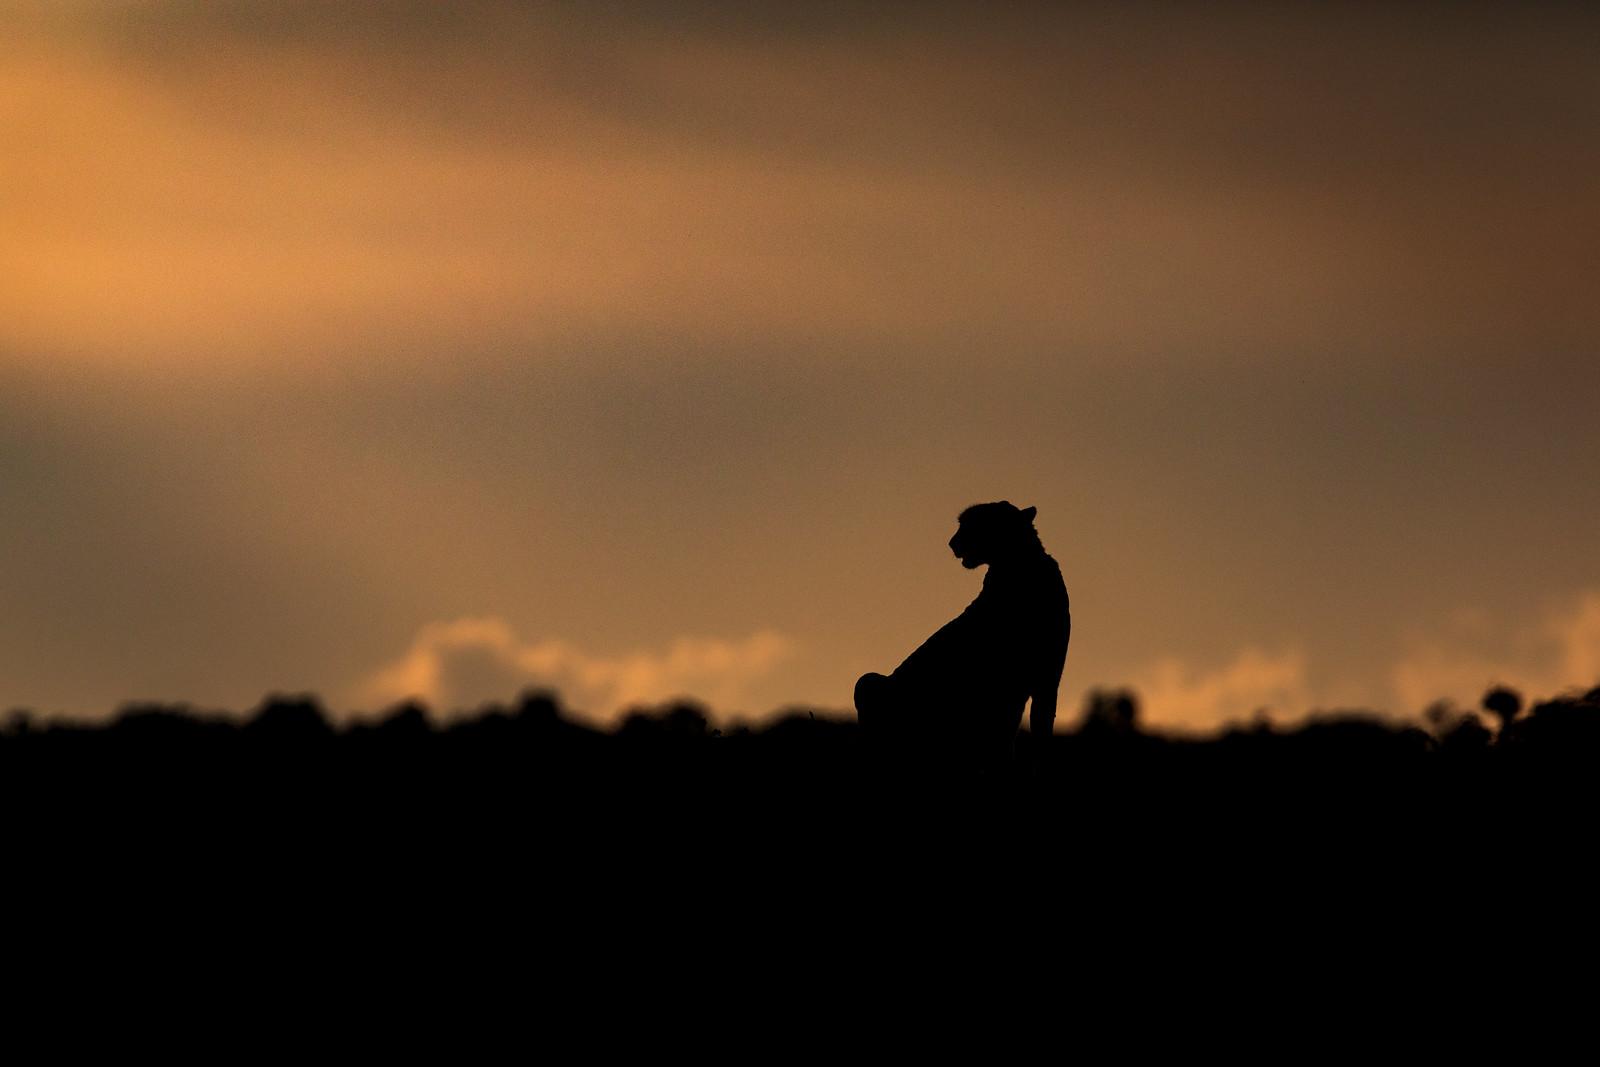 Kisaru in Silhouette